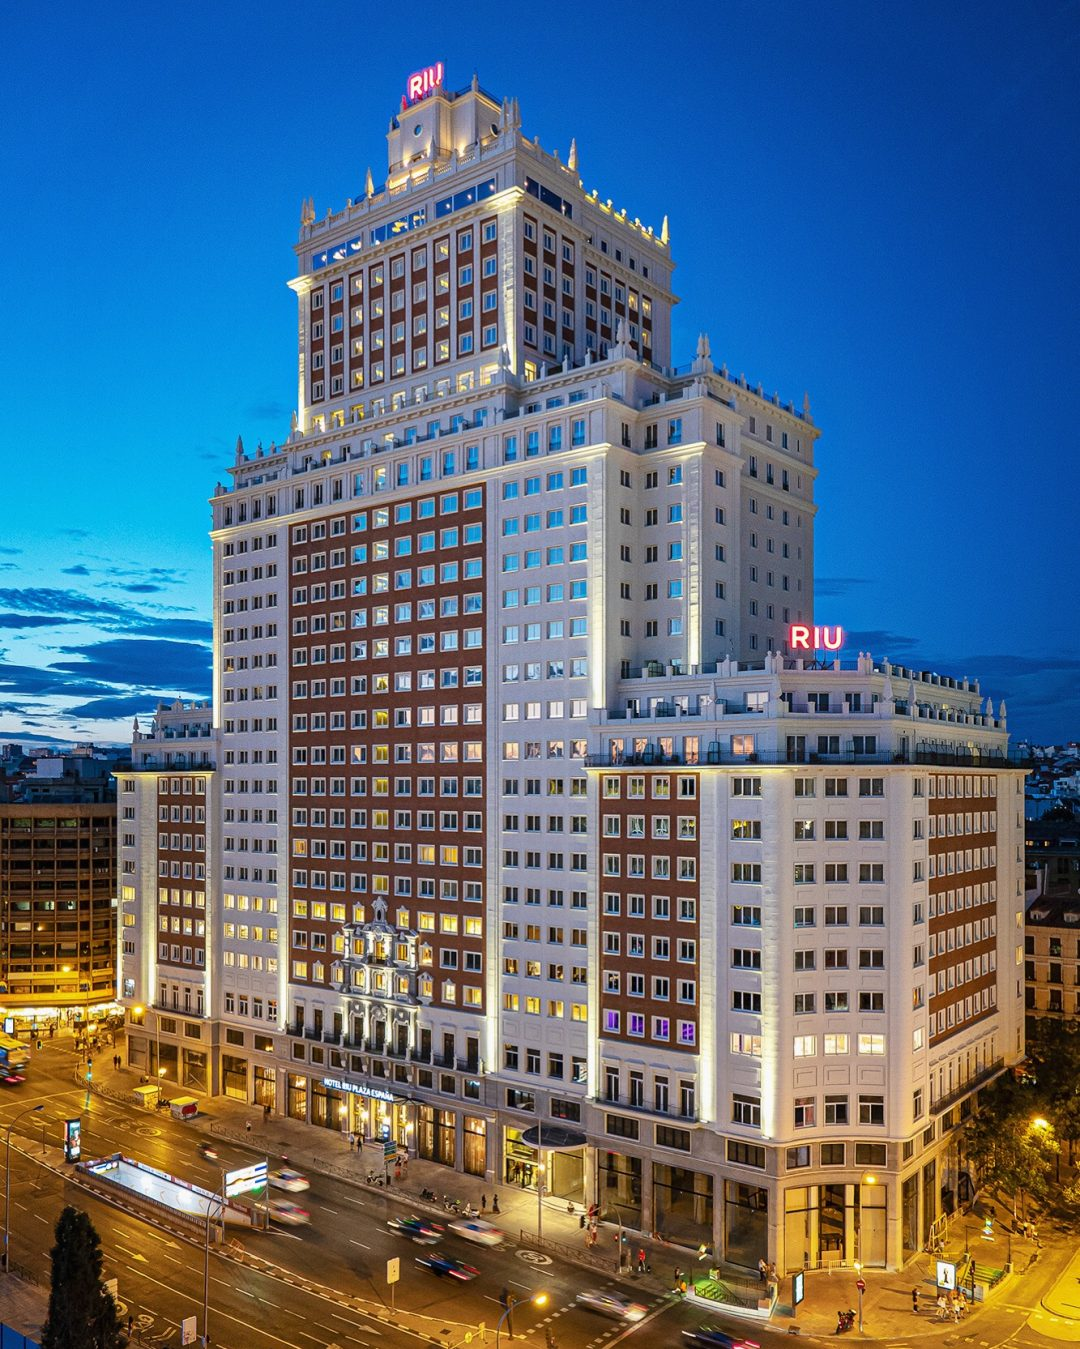 hotel-riu-plaza-españa-por-adolfo-gosalvez